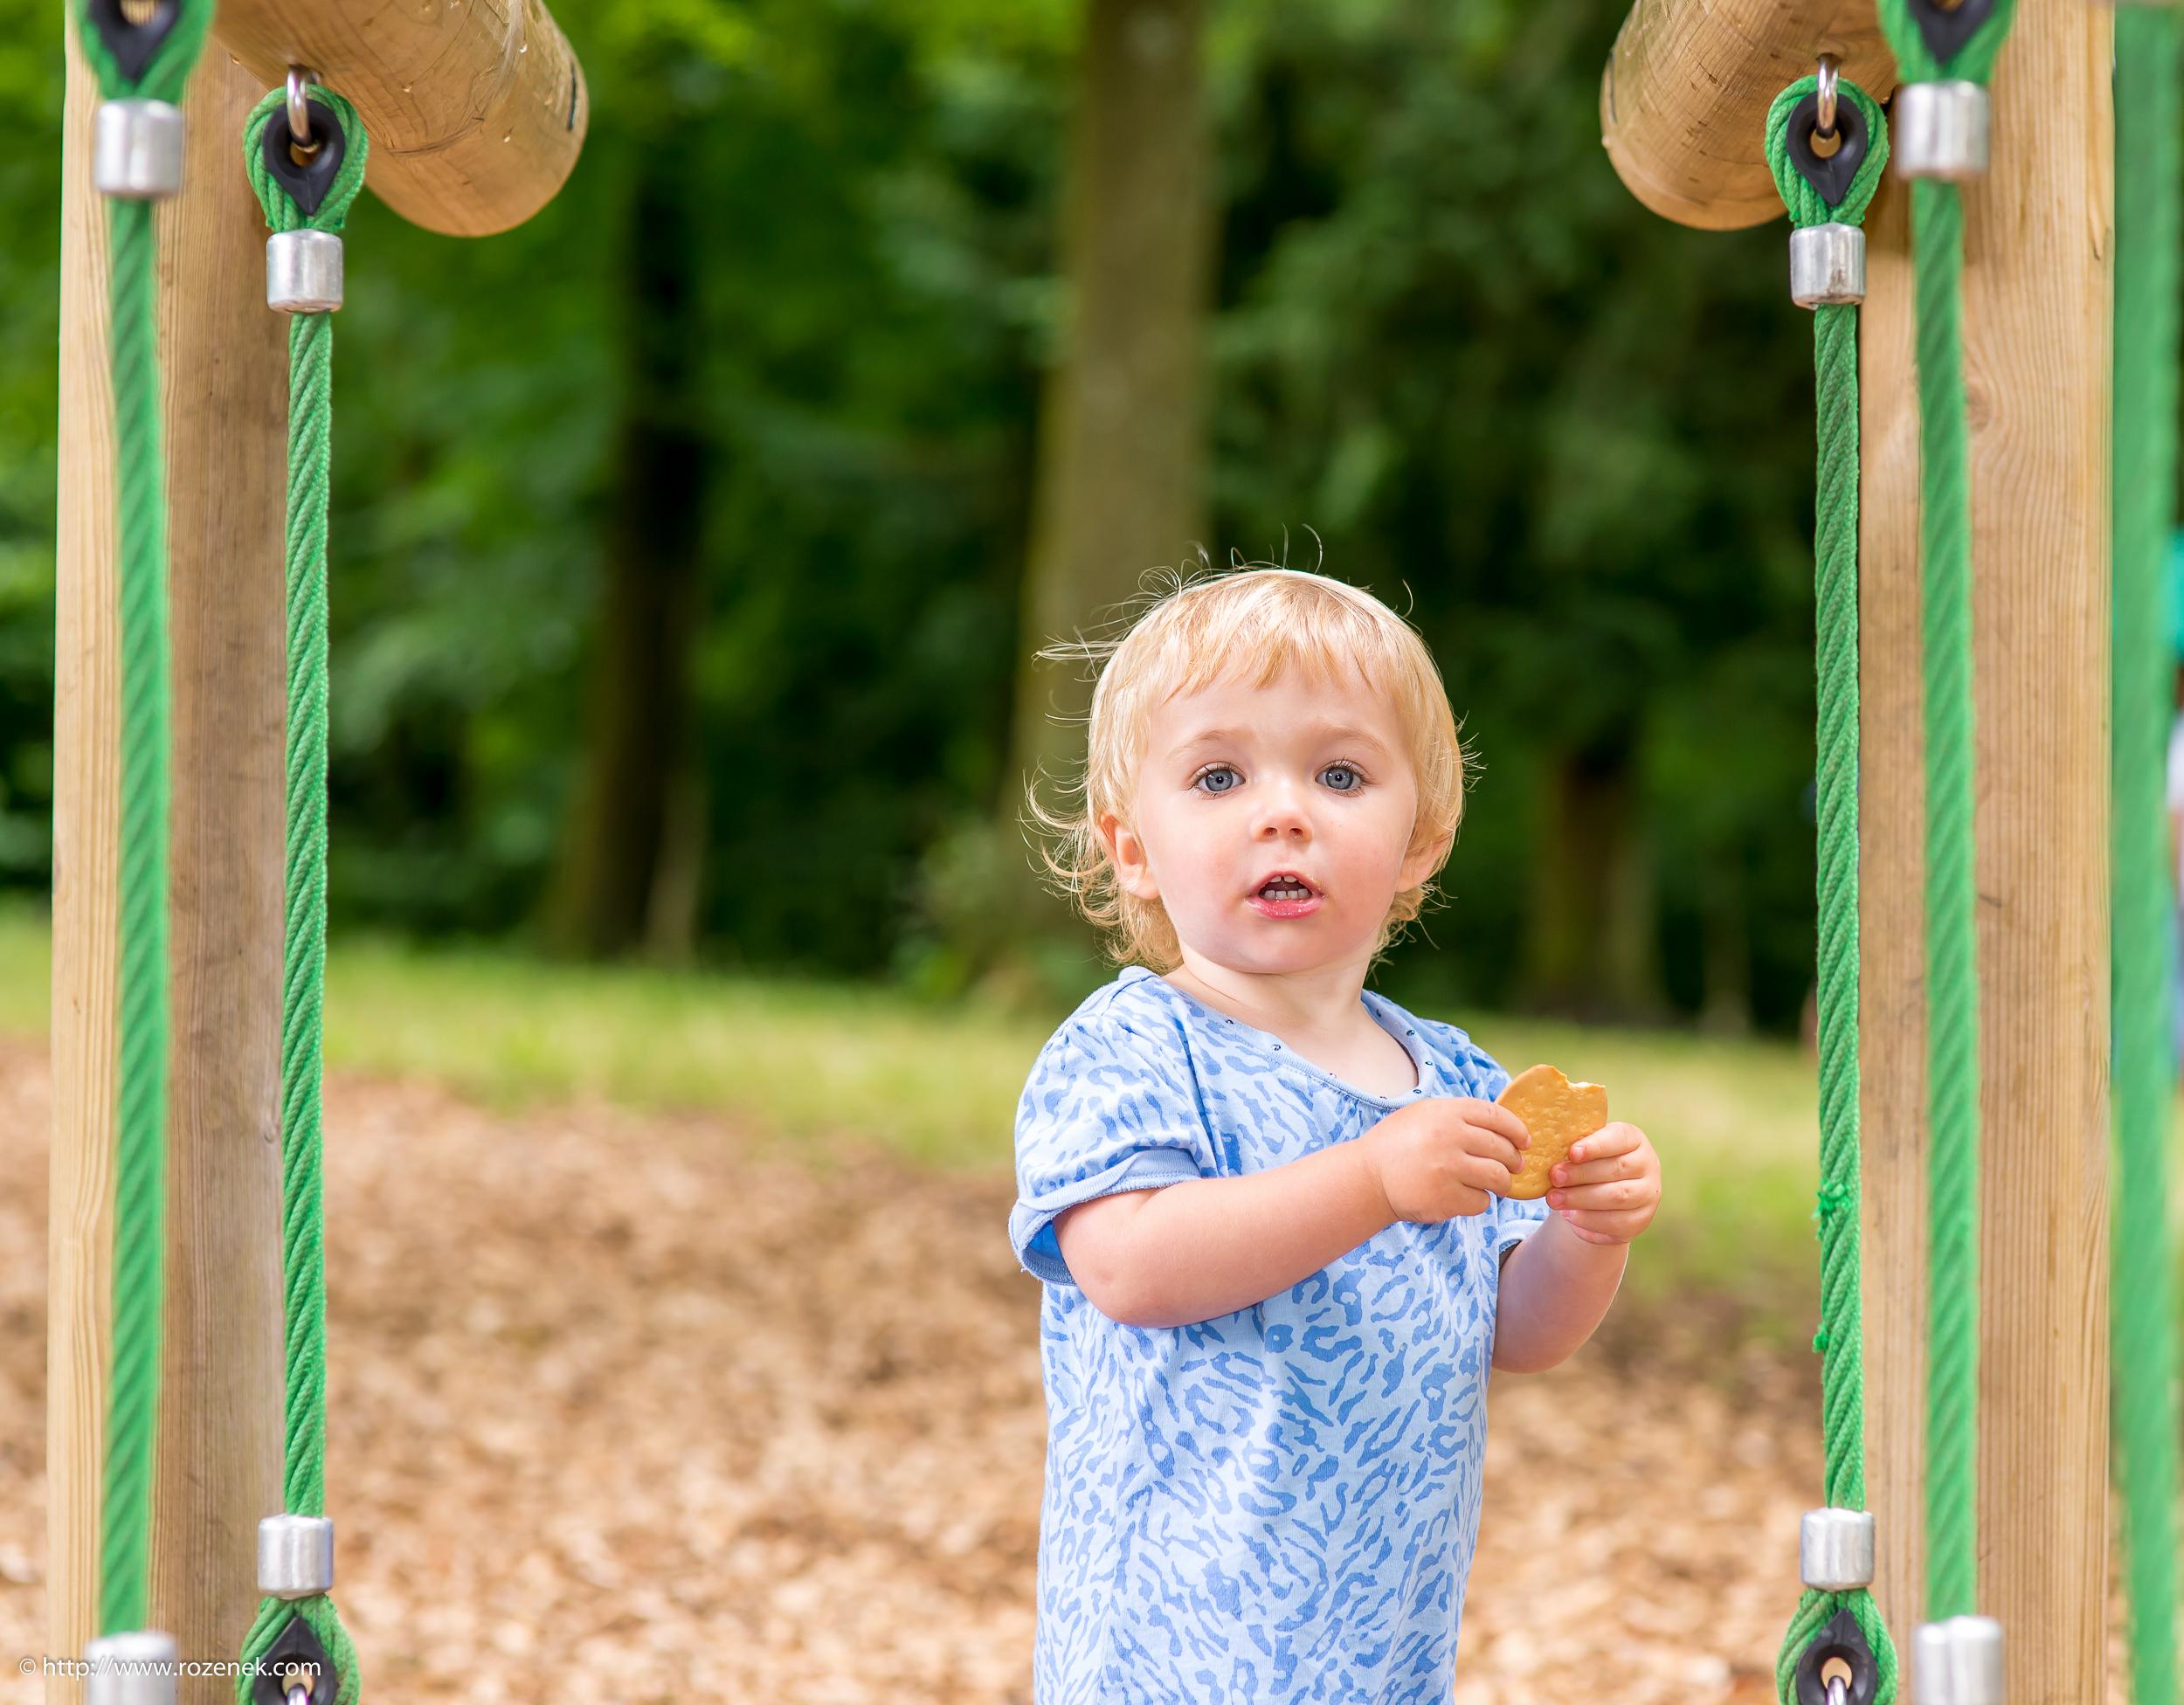 2016.08.05 - Karina at Queen Elizabeth Country Park - 07